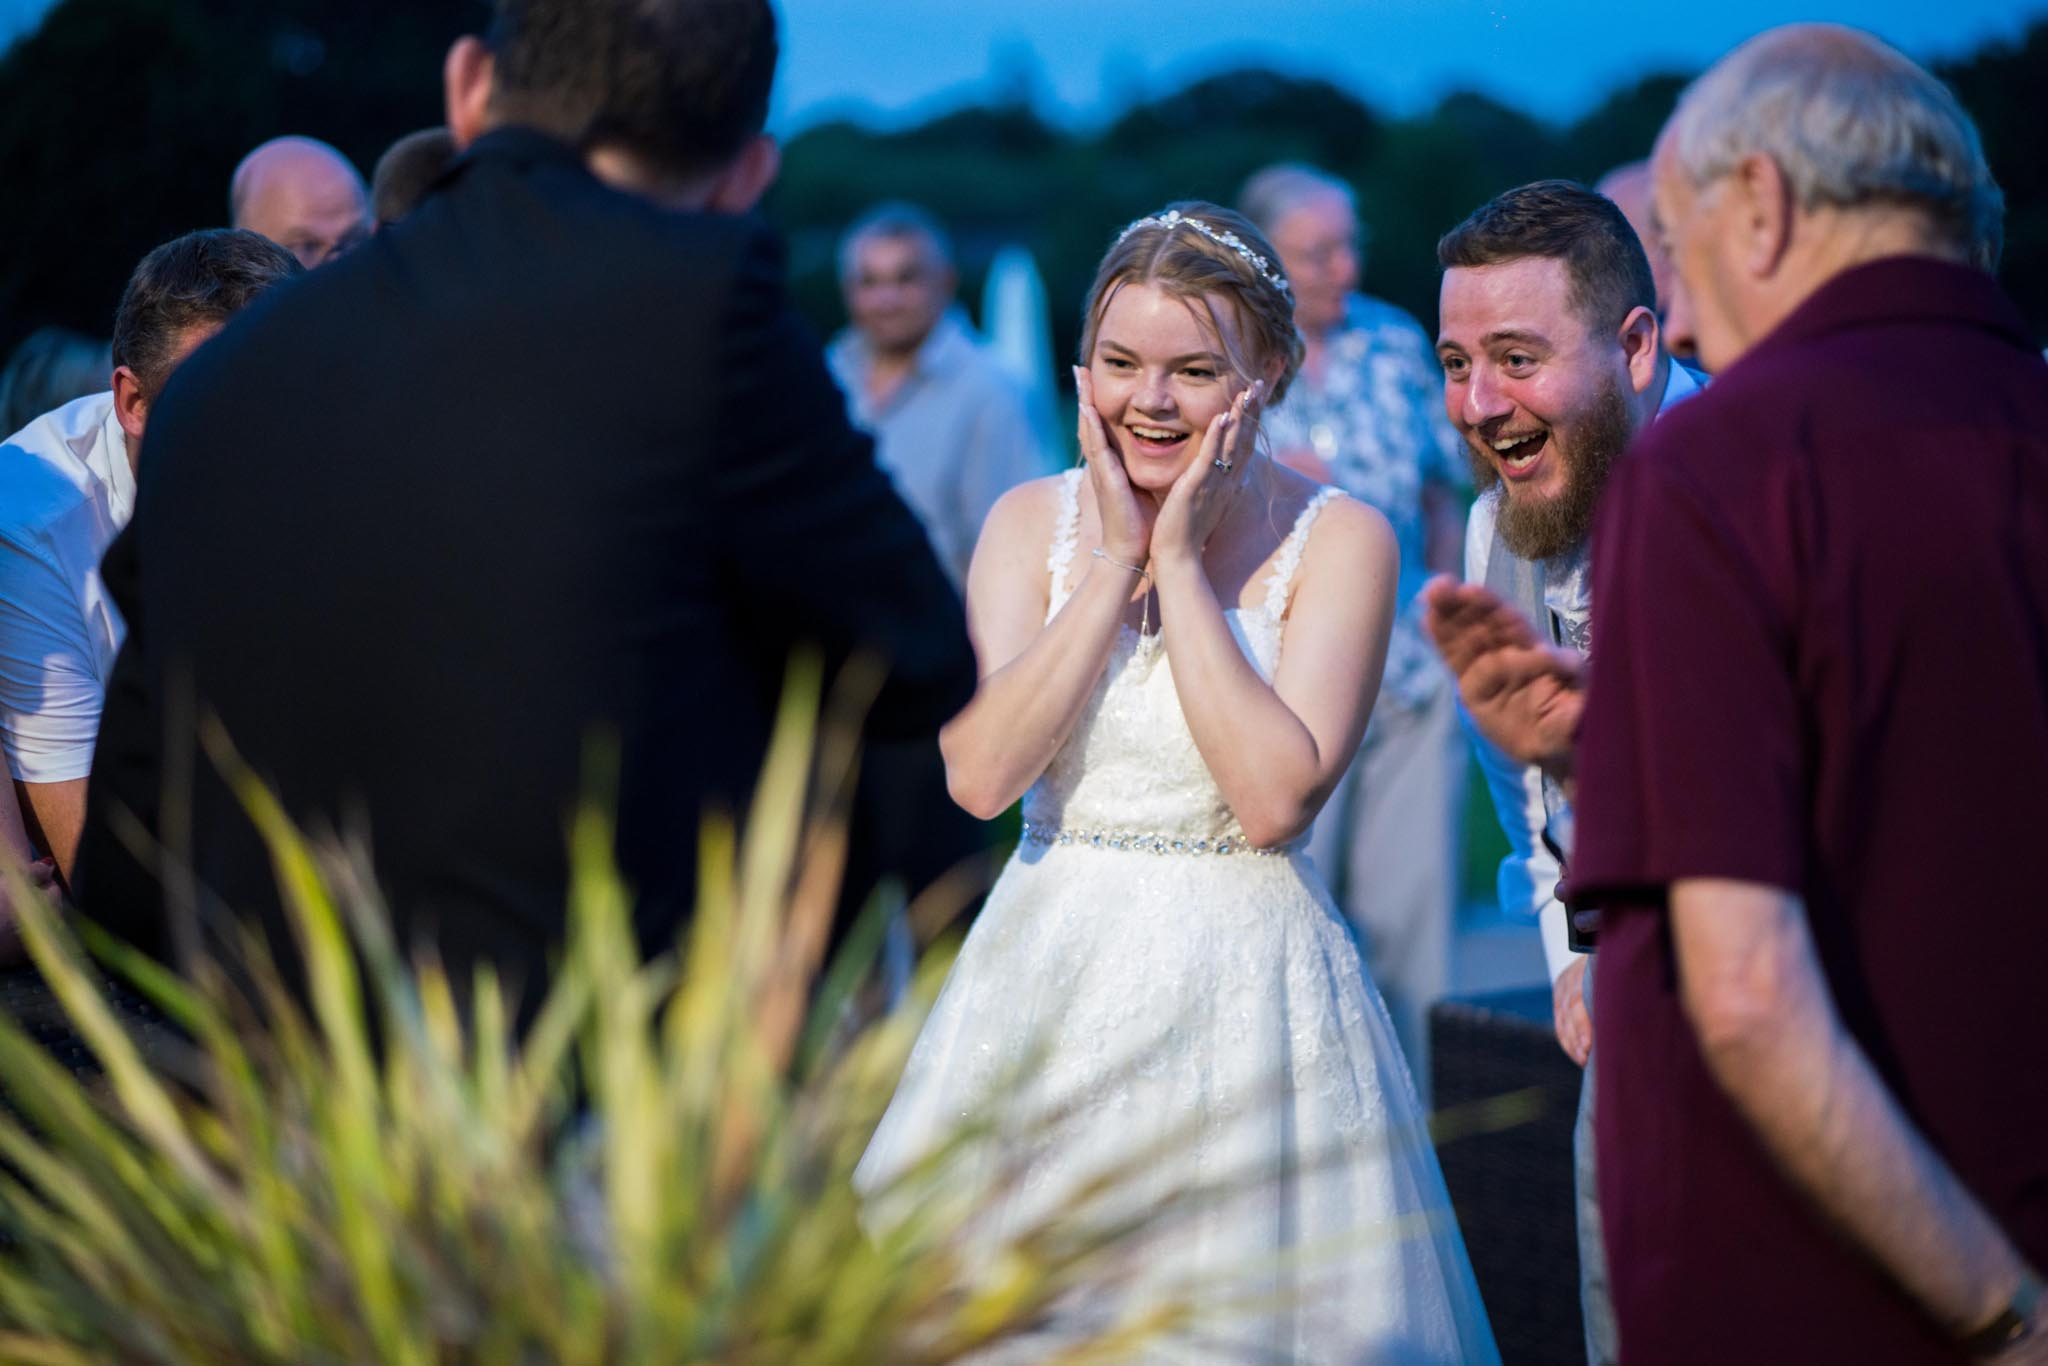 990-Night-Reception-Luke-Yasmin-The-Rayleigh-Club-Wedding-Photography.jpg